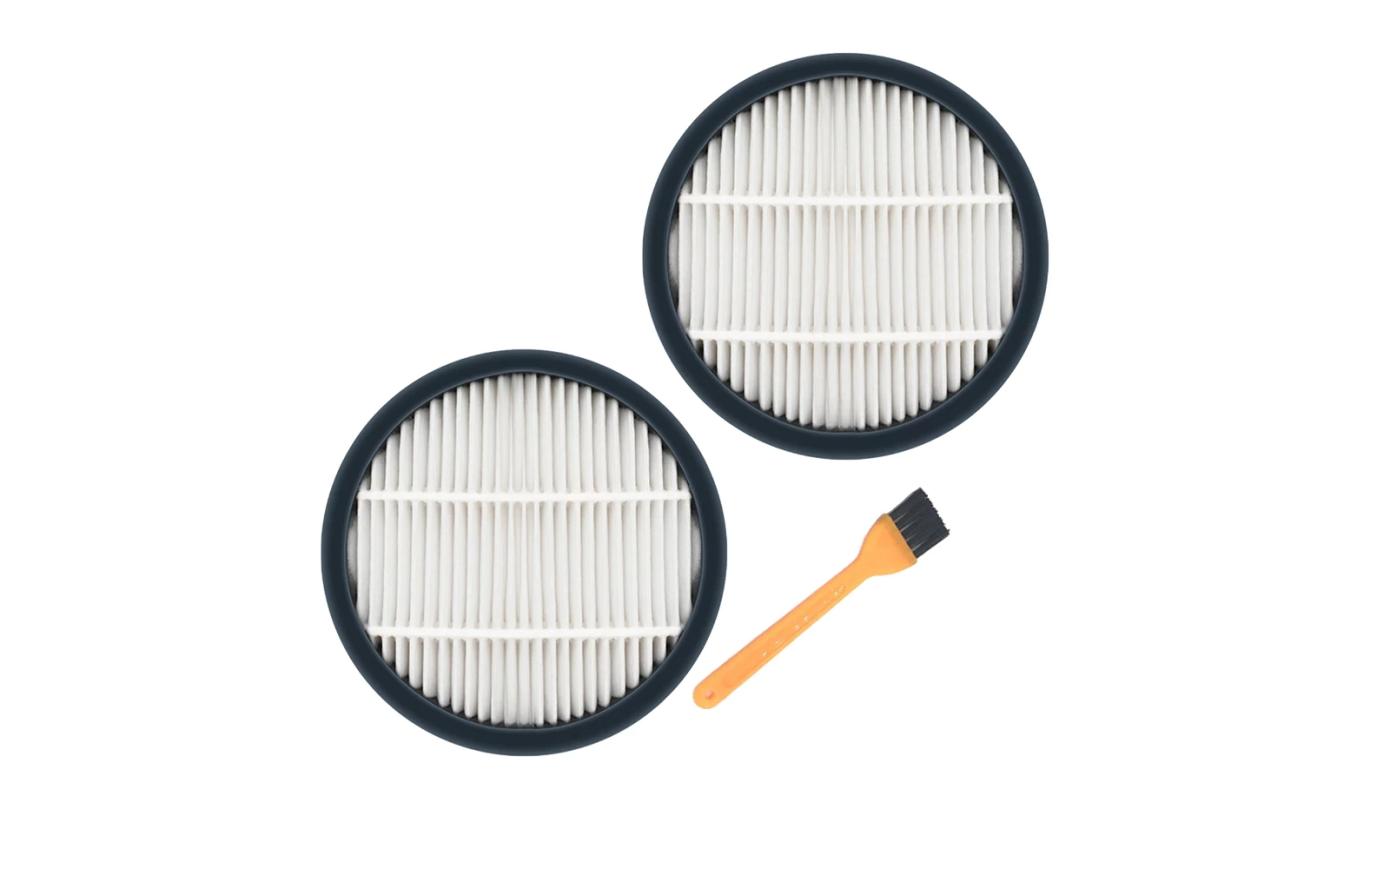 Opisanie Besprovodnoj Ruchnoj Pylesos Xiaomi Deerma Wireless Vacuum Cleaner Vc40 5